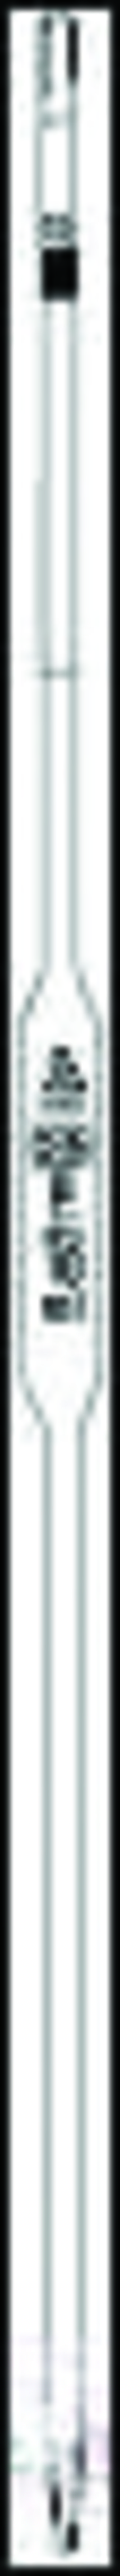 Witeg™Blaskopf-Vollpipetten der Klasse B Capacity: 100 mL Witeg™Blaskopf-Vollpipetten der Klasse B